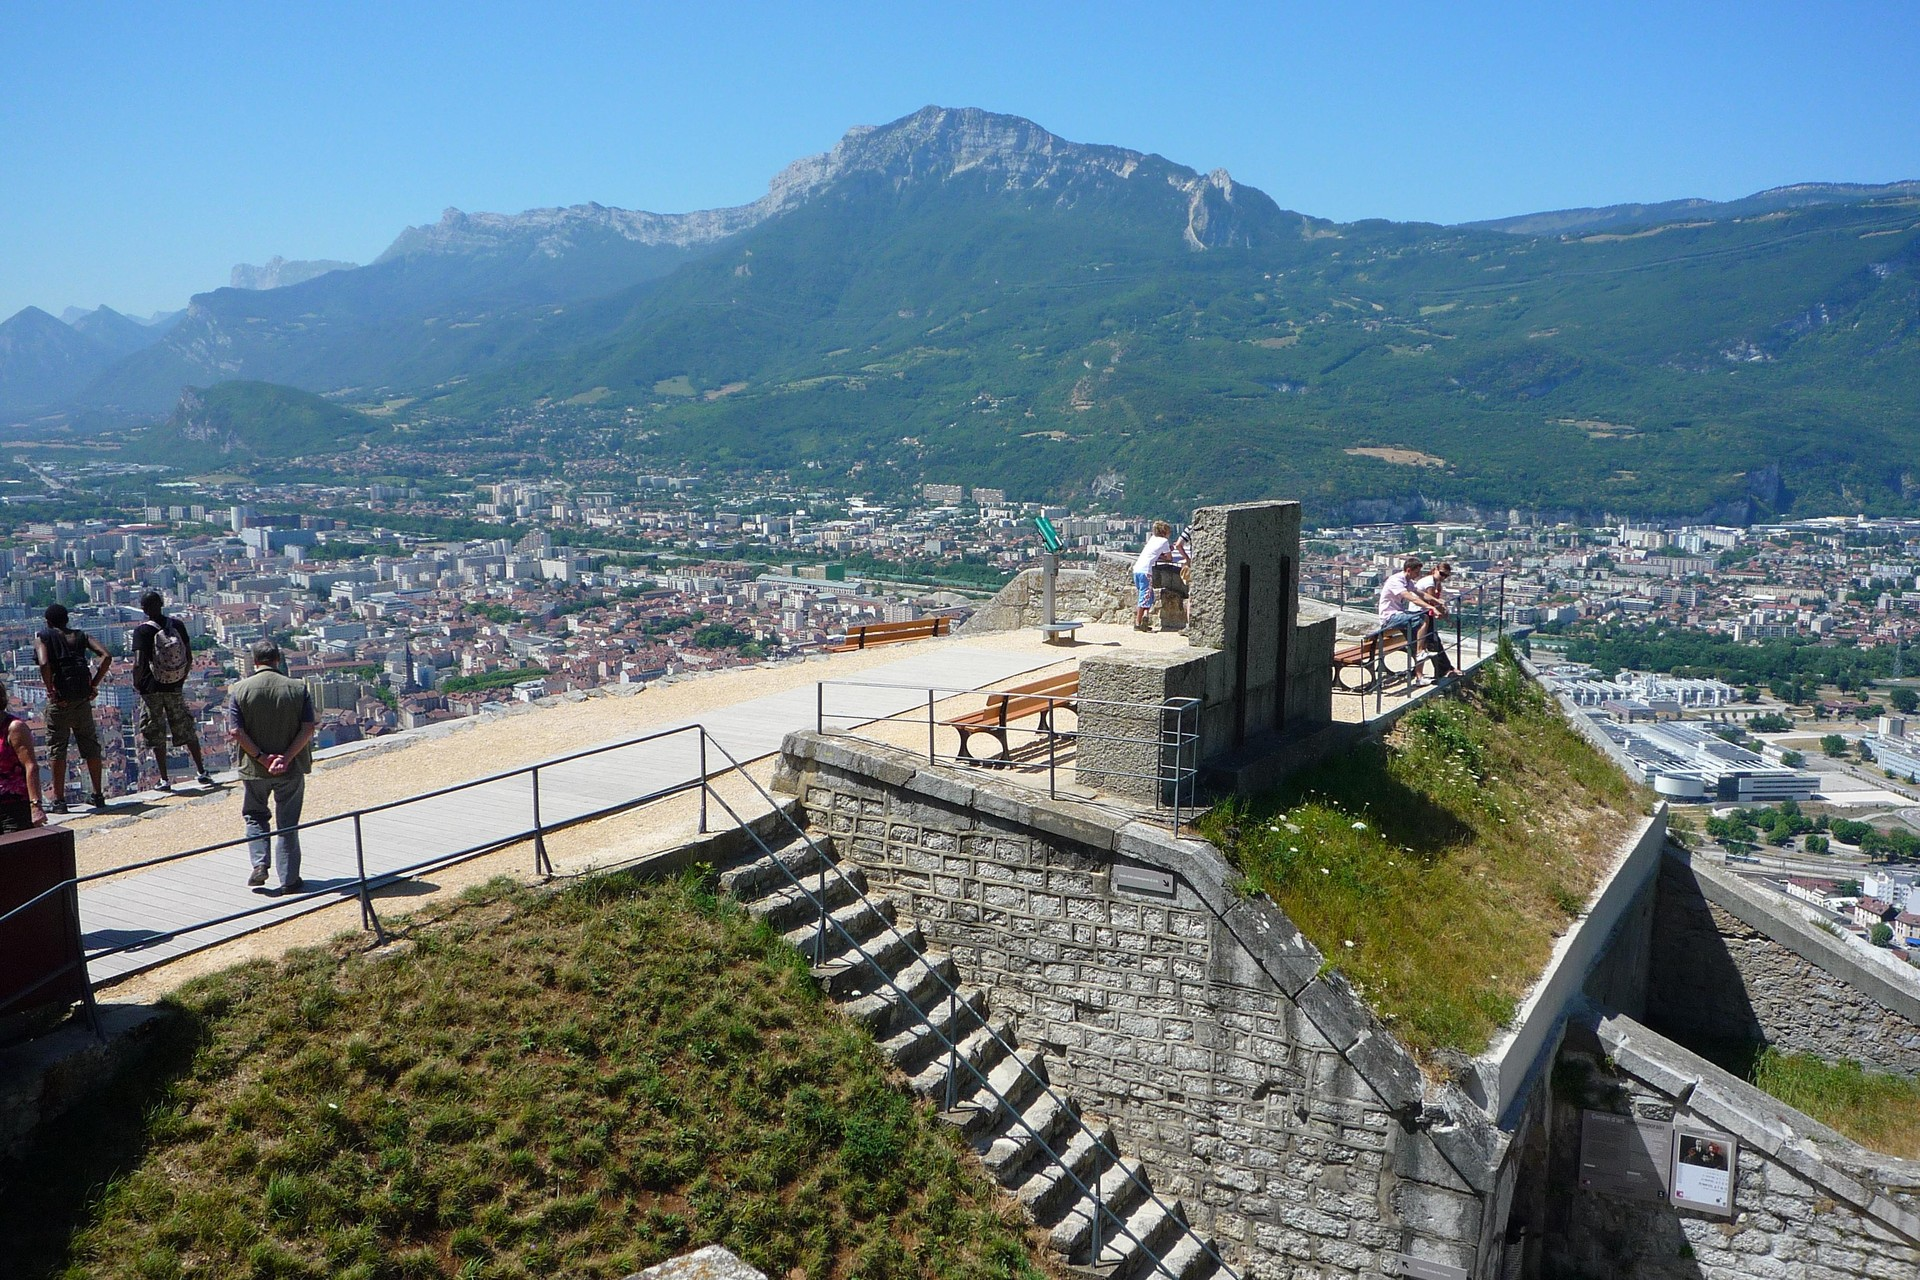 Esperienza Erasmus a Grenoble (Francia), di Cindy